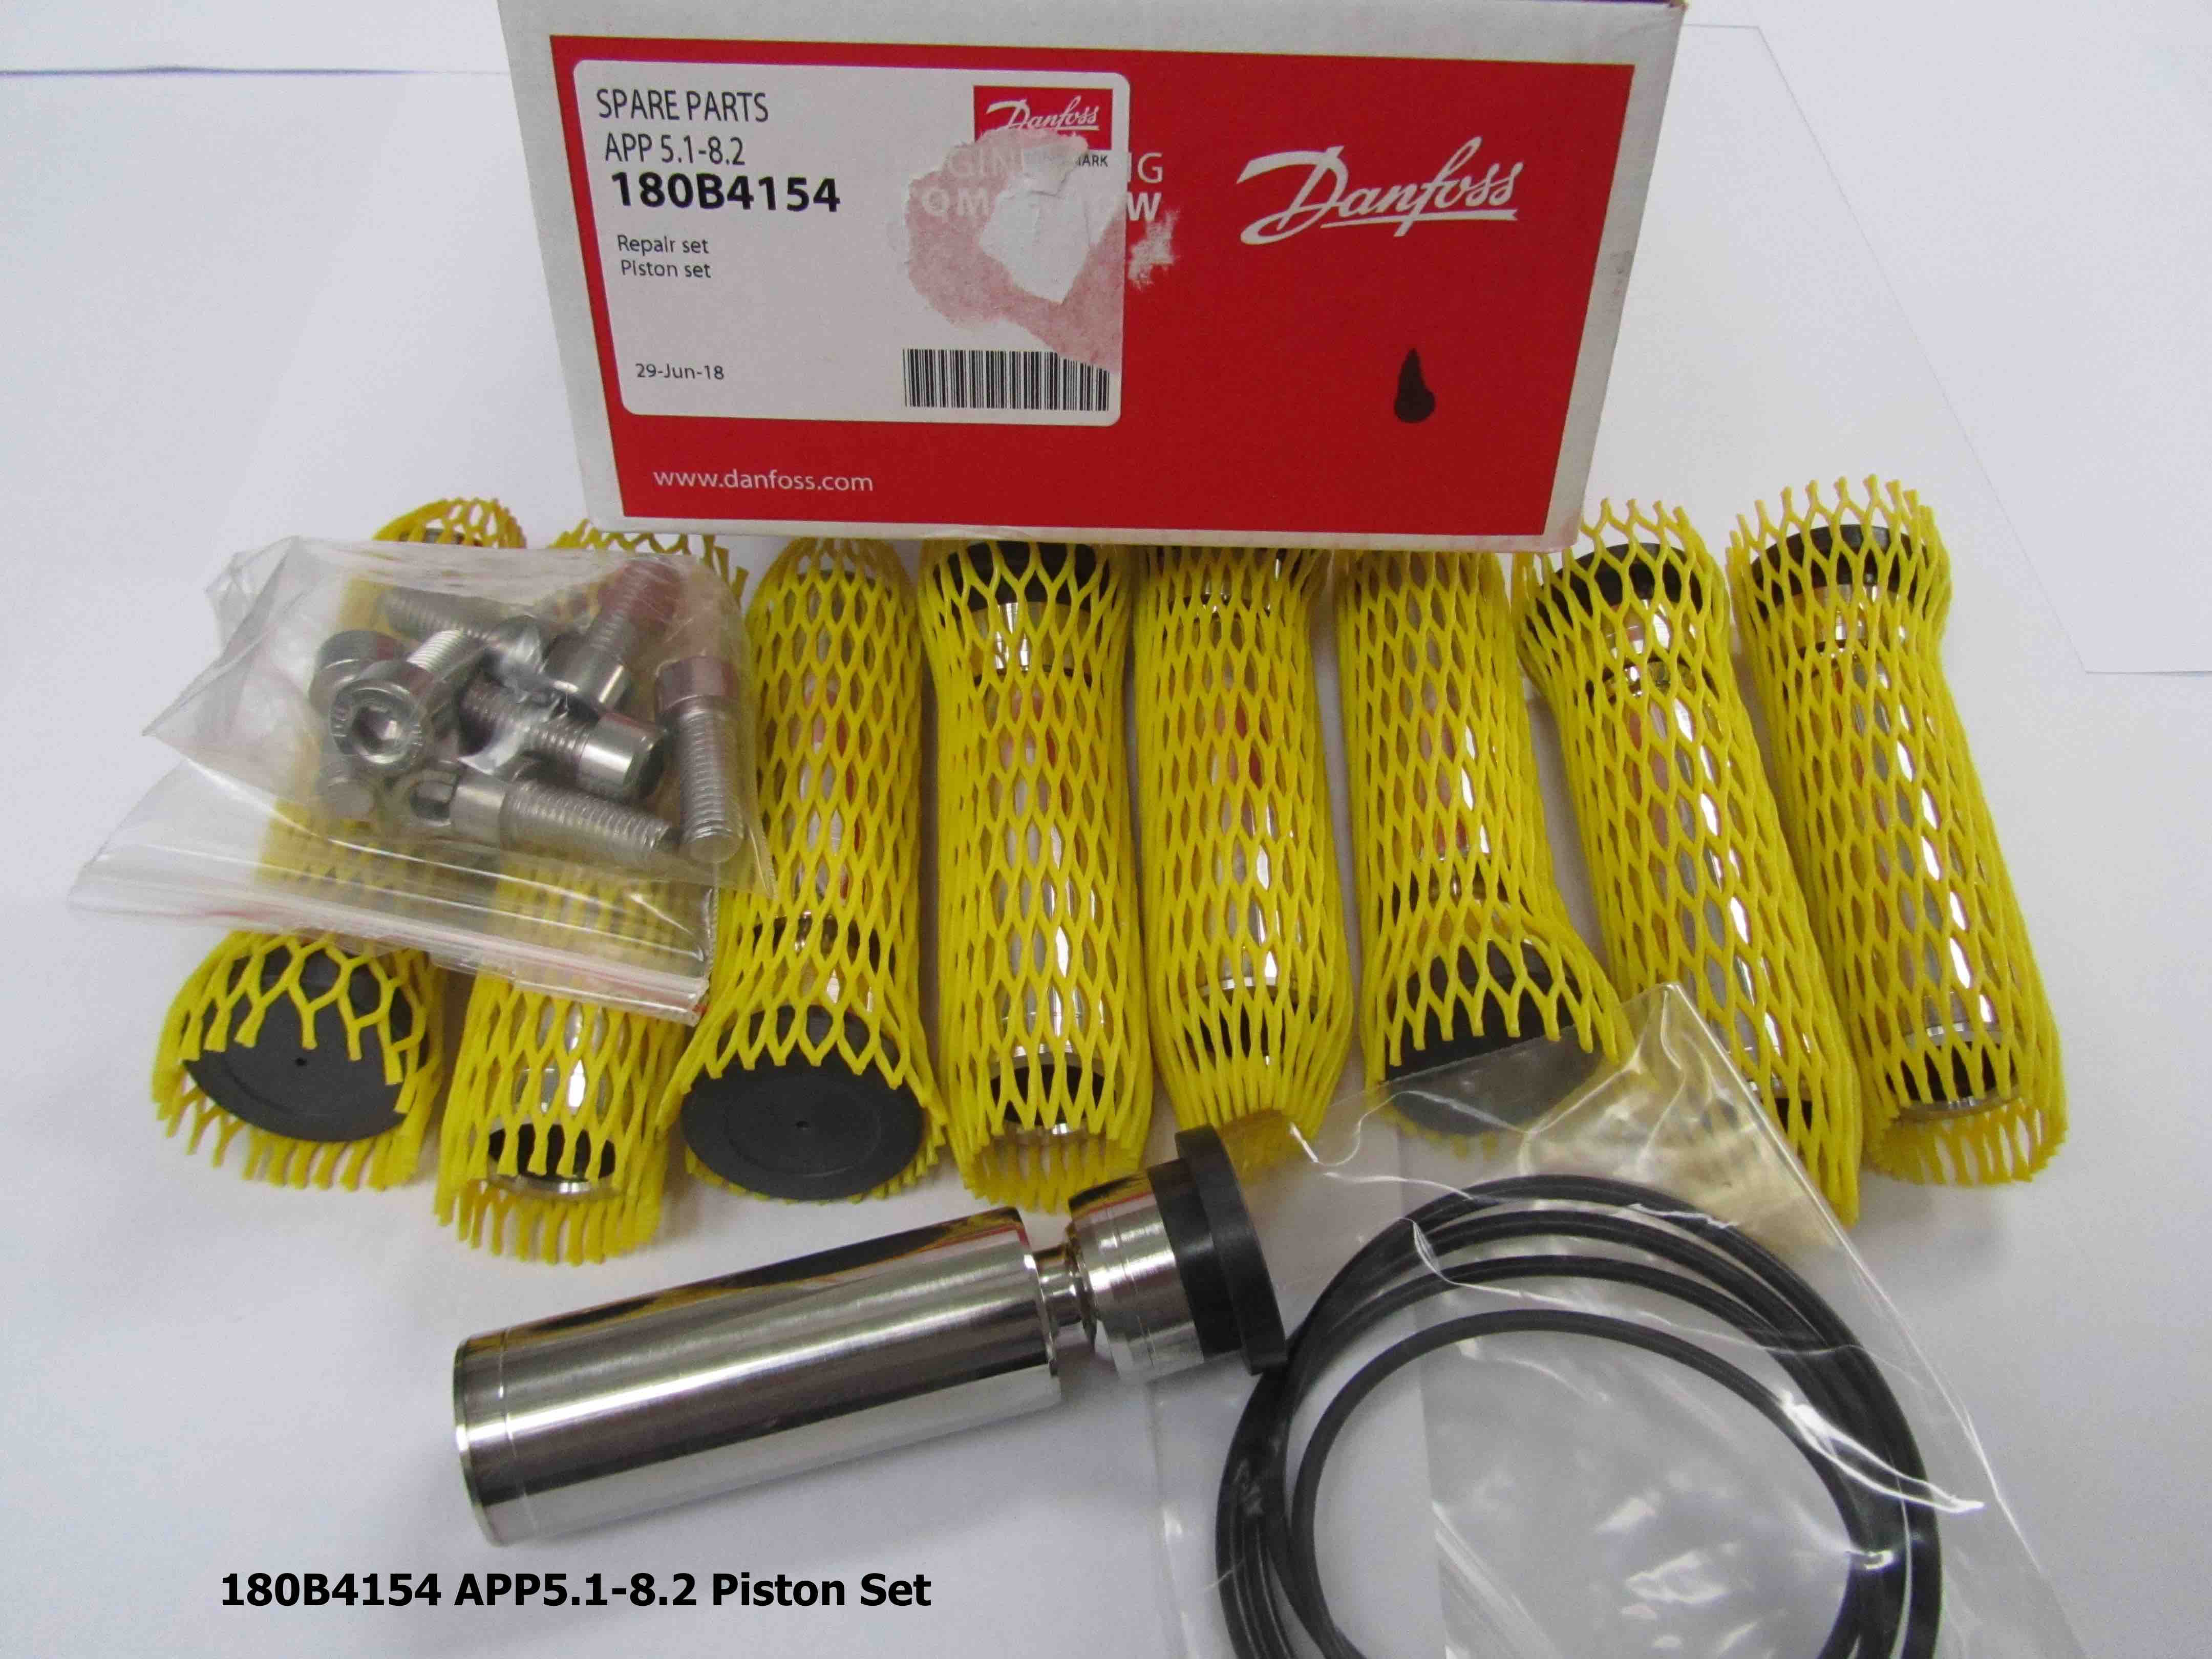 180B4154-APP5.1-8.2-Piston-Set